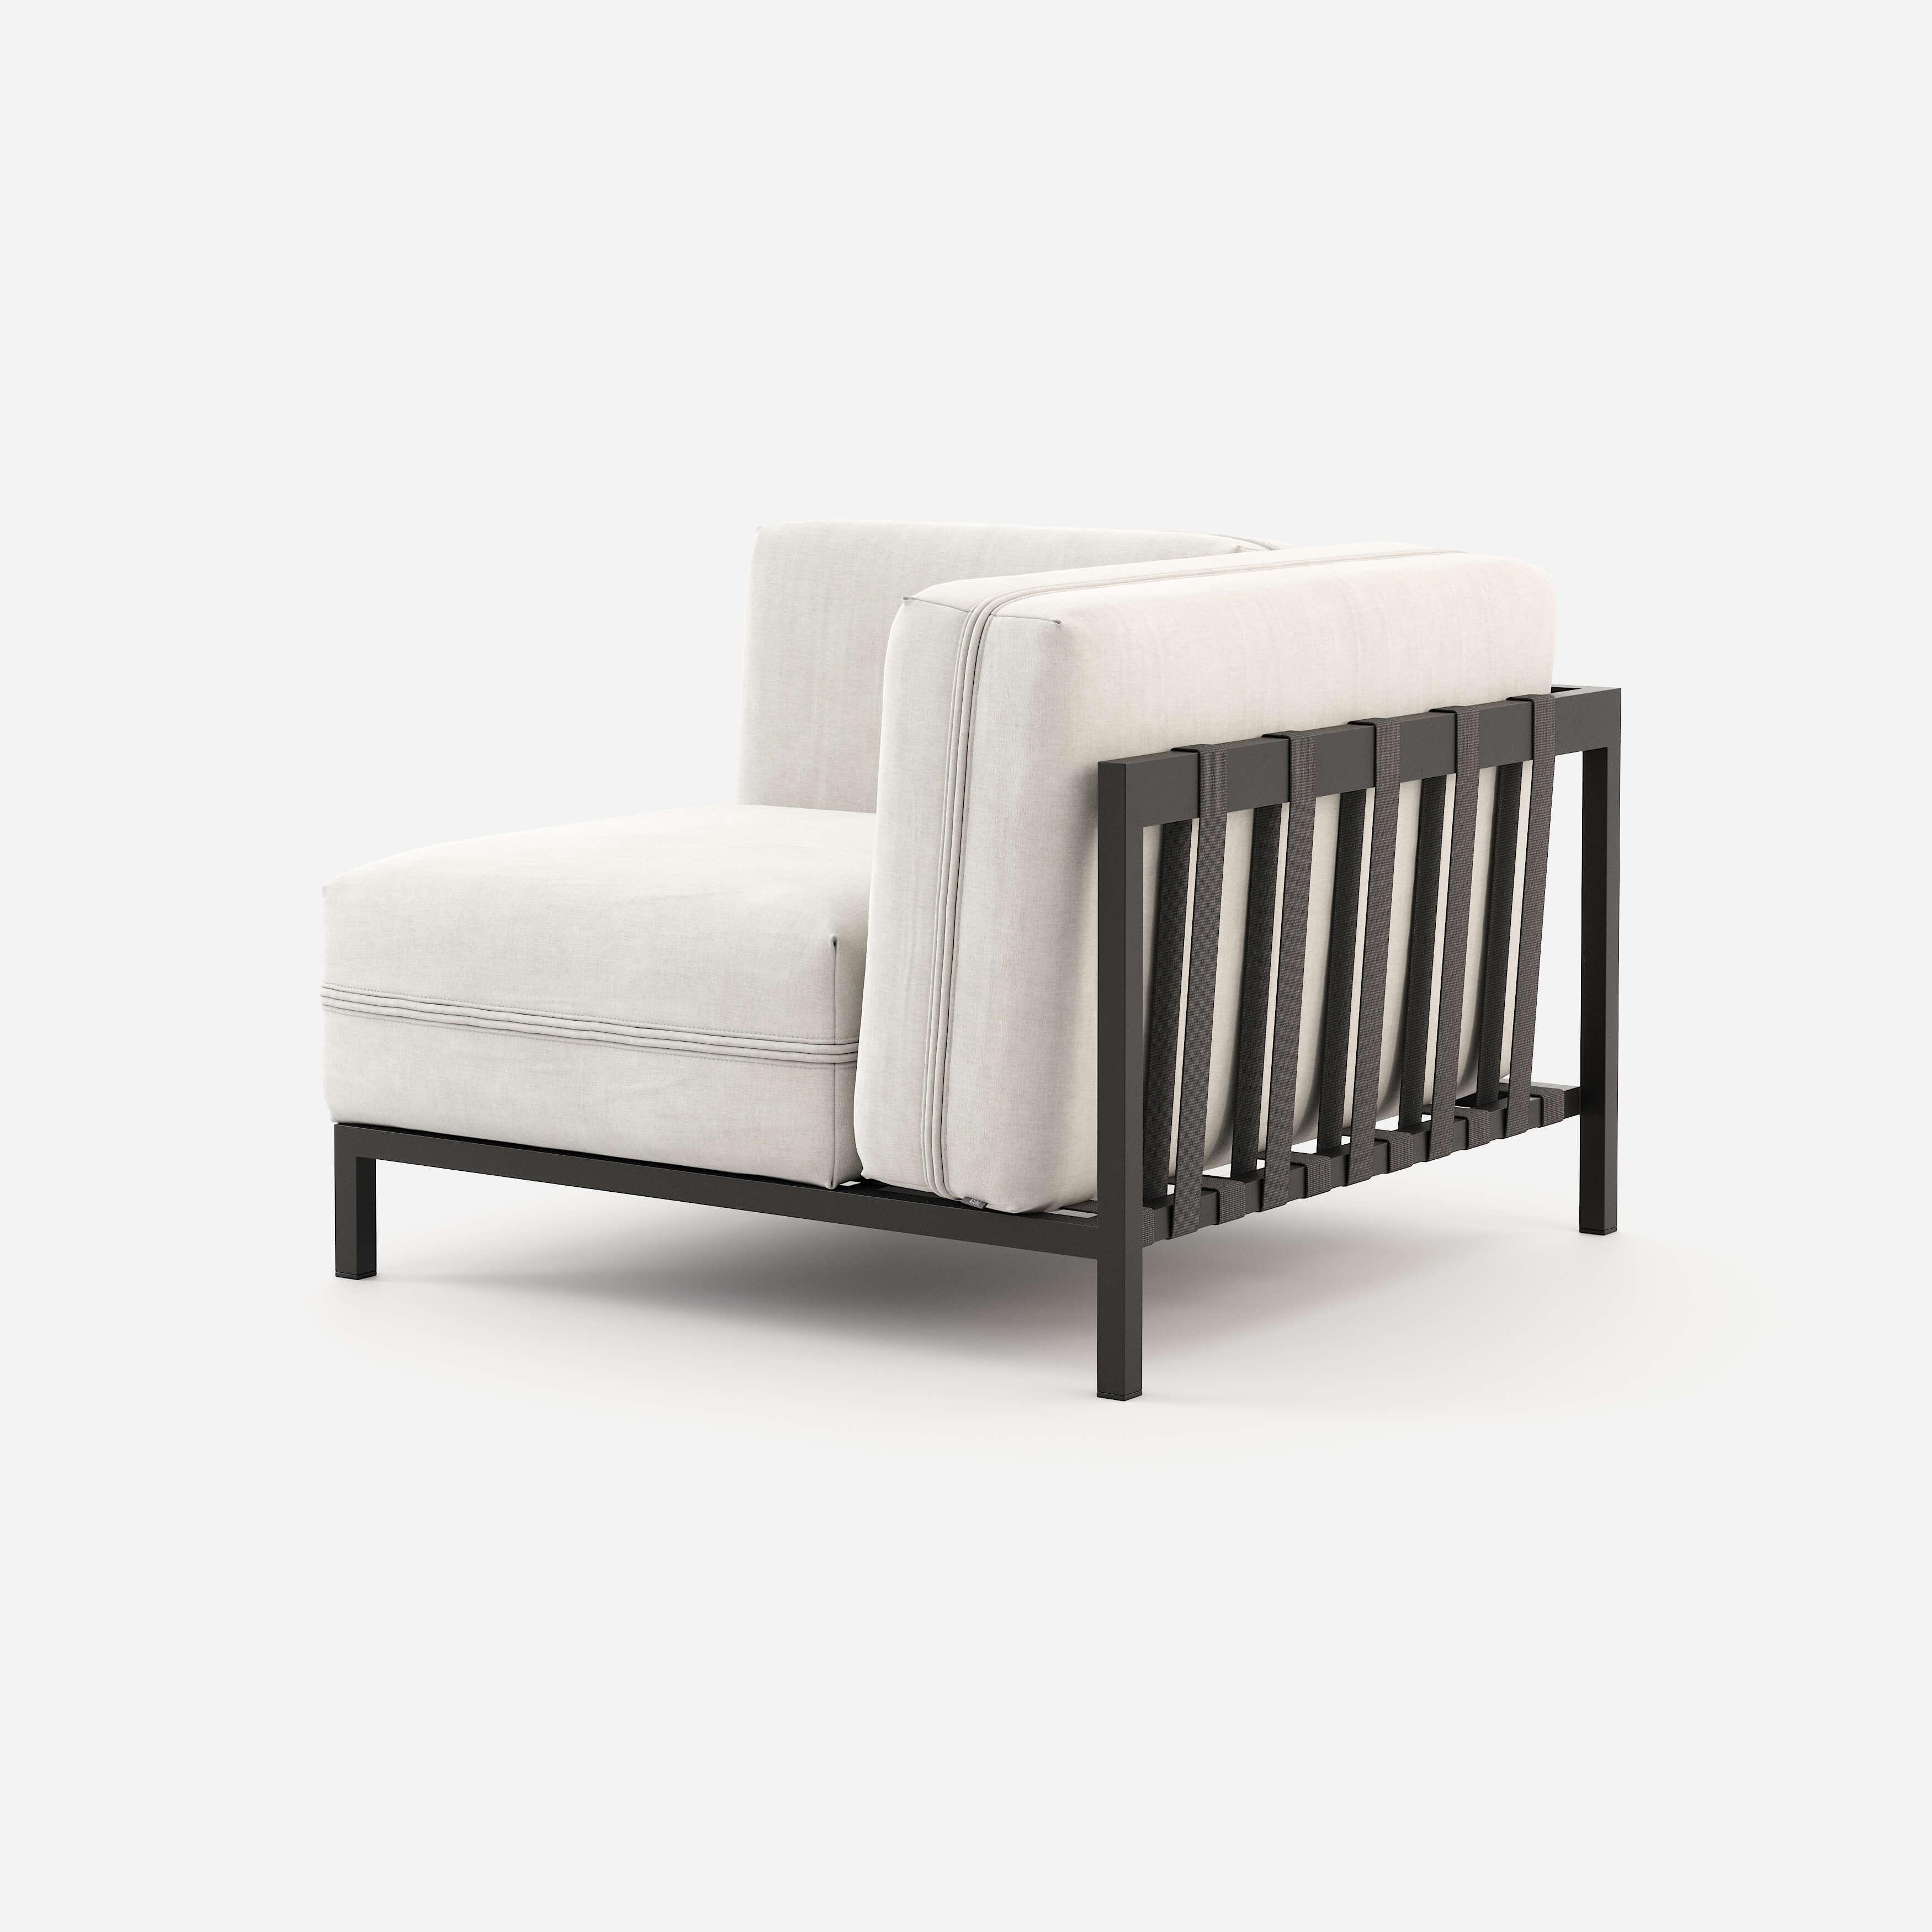 Bondi Corner Sofa-upholstery-domkapa-outdoor-collection-interior-design-home-furniture-home-decor-trends-4